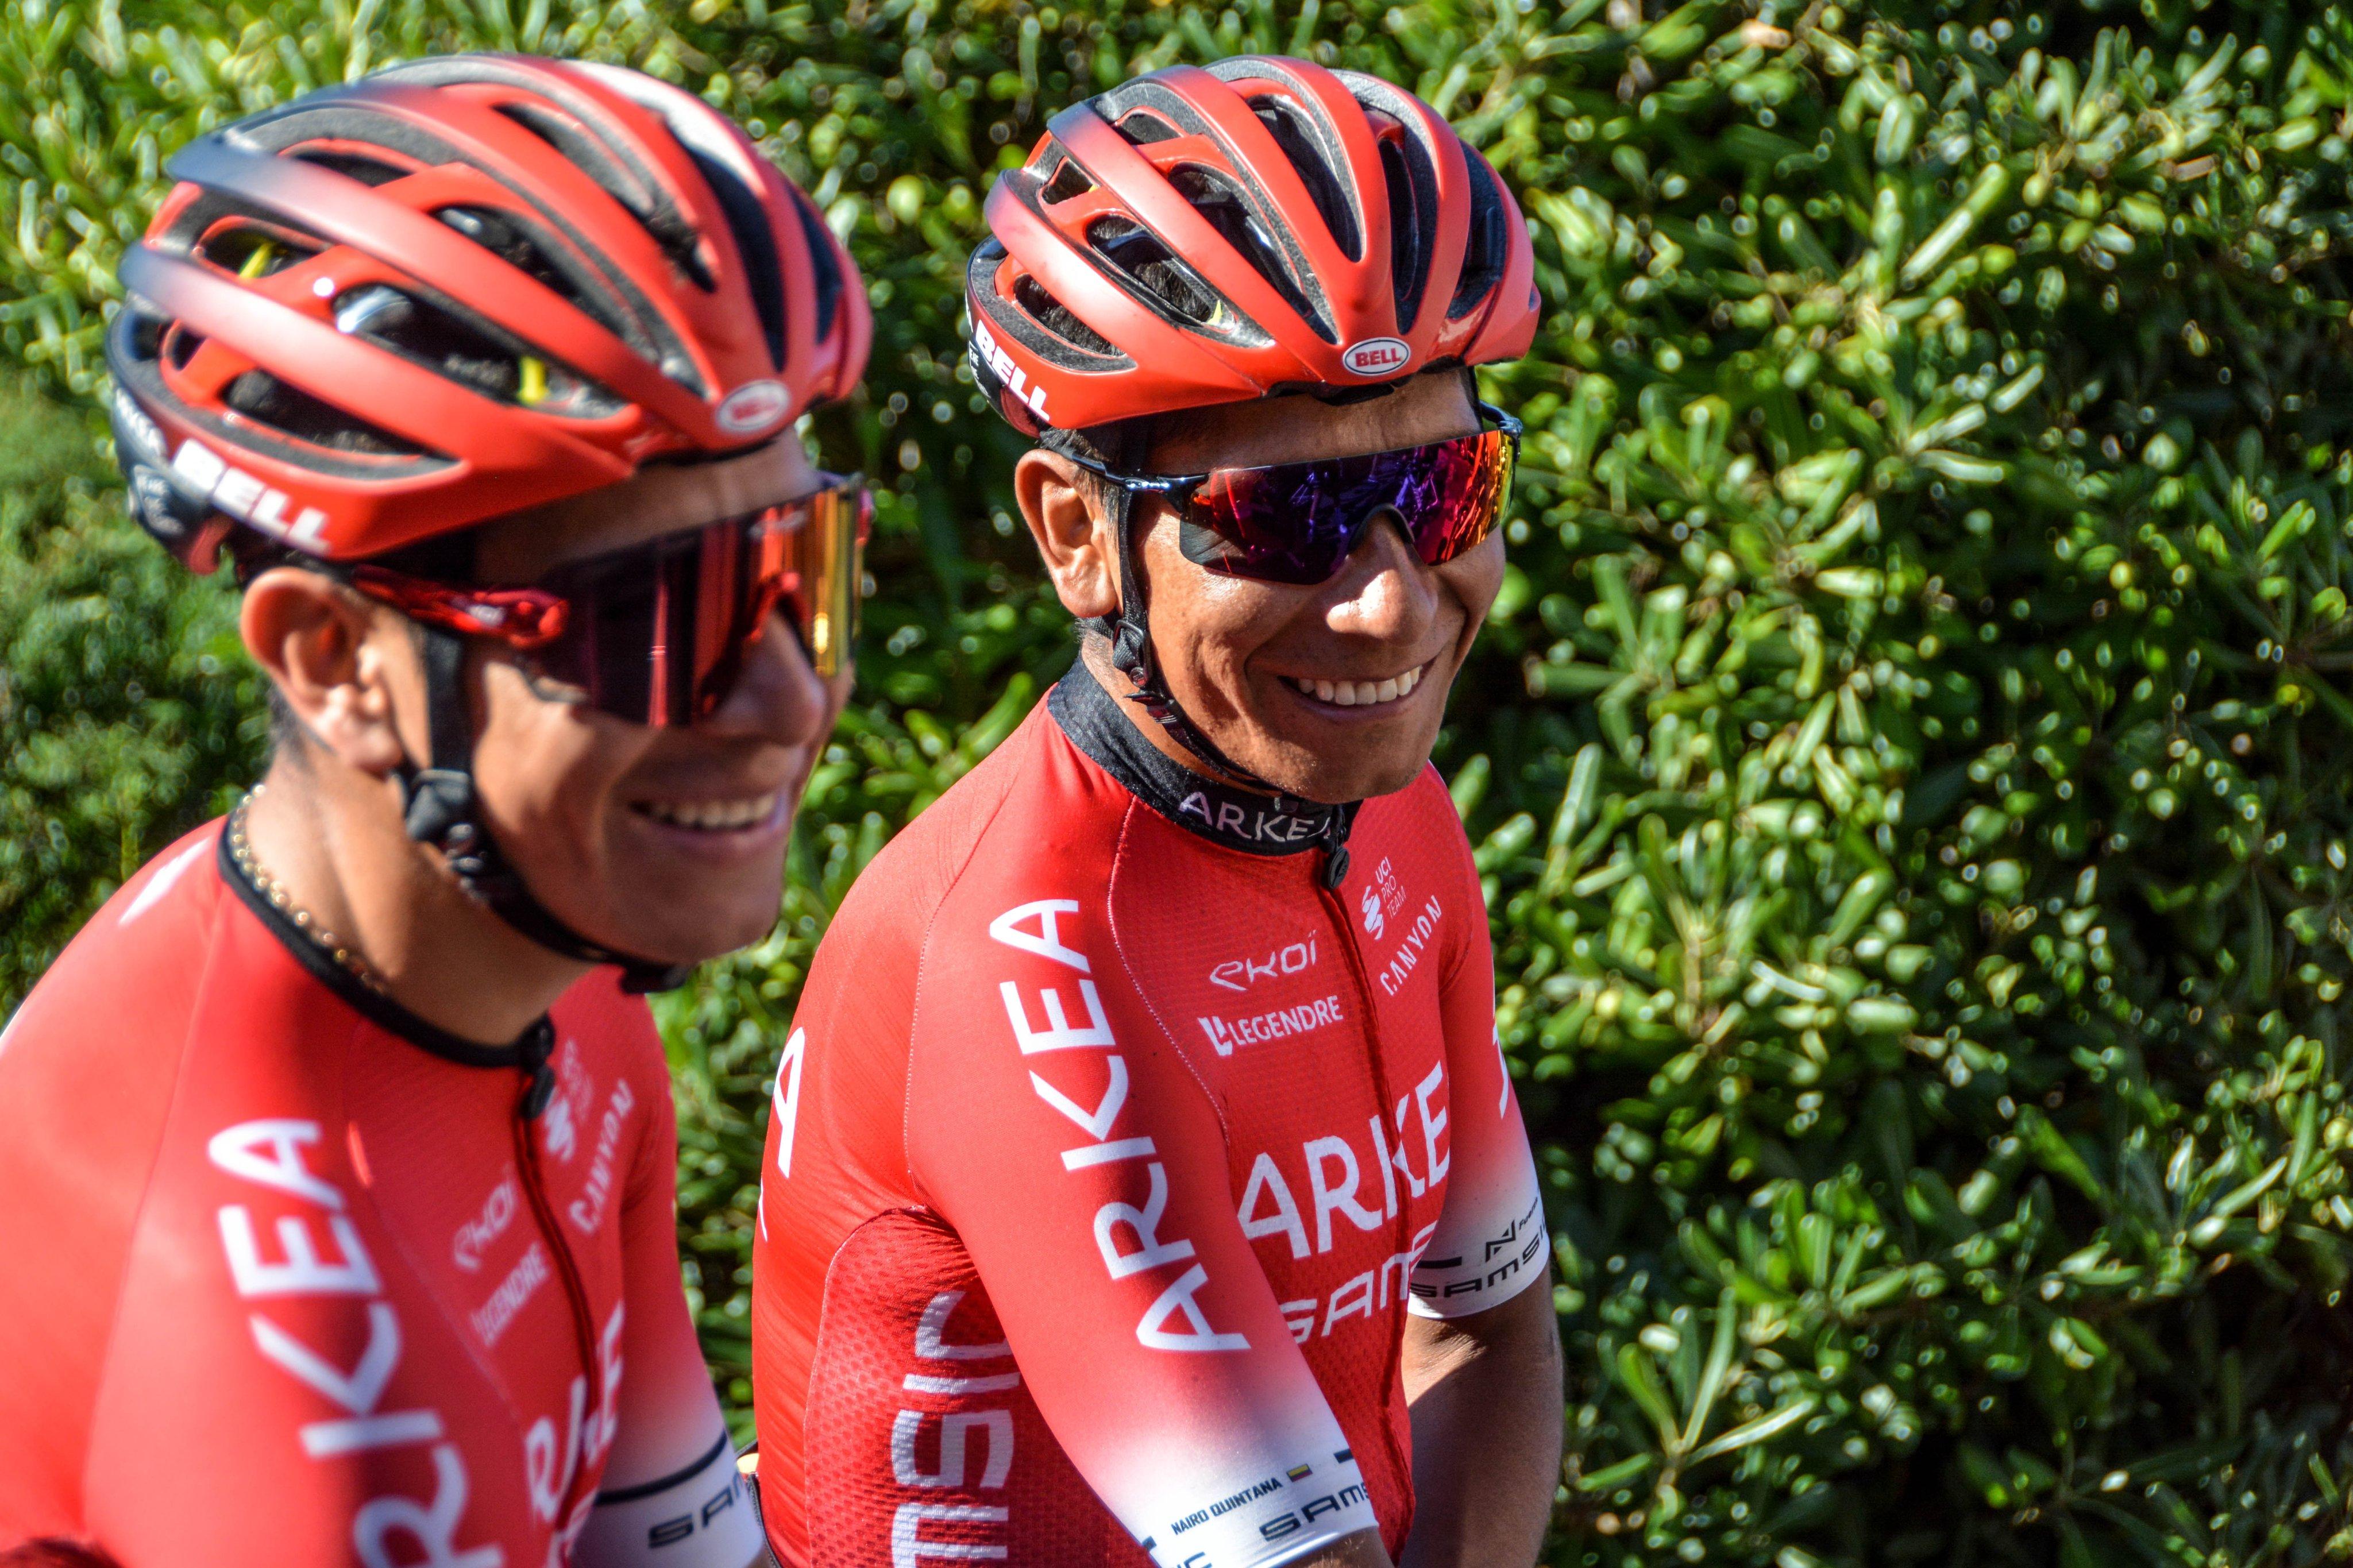 Nairo Quintana otro favorito Tour de Francia 2020 - ph. Arkea Samsic - www.ciclismocolombiano.com